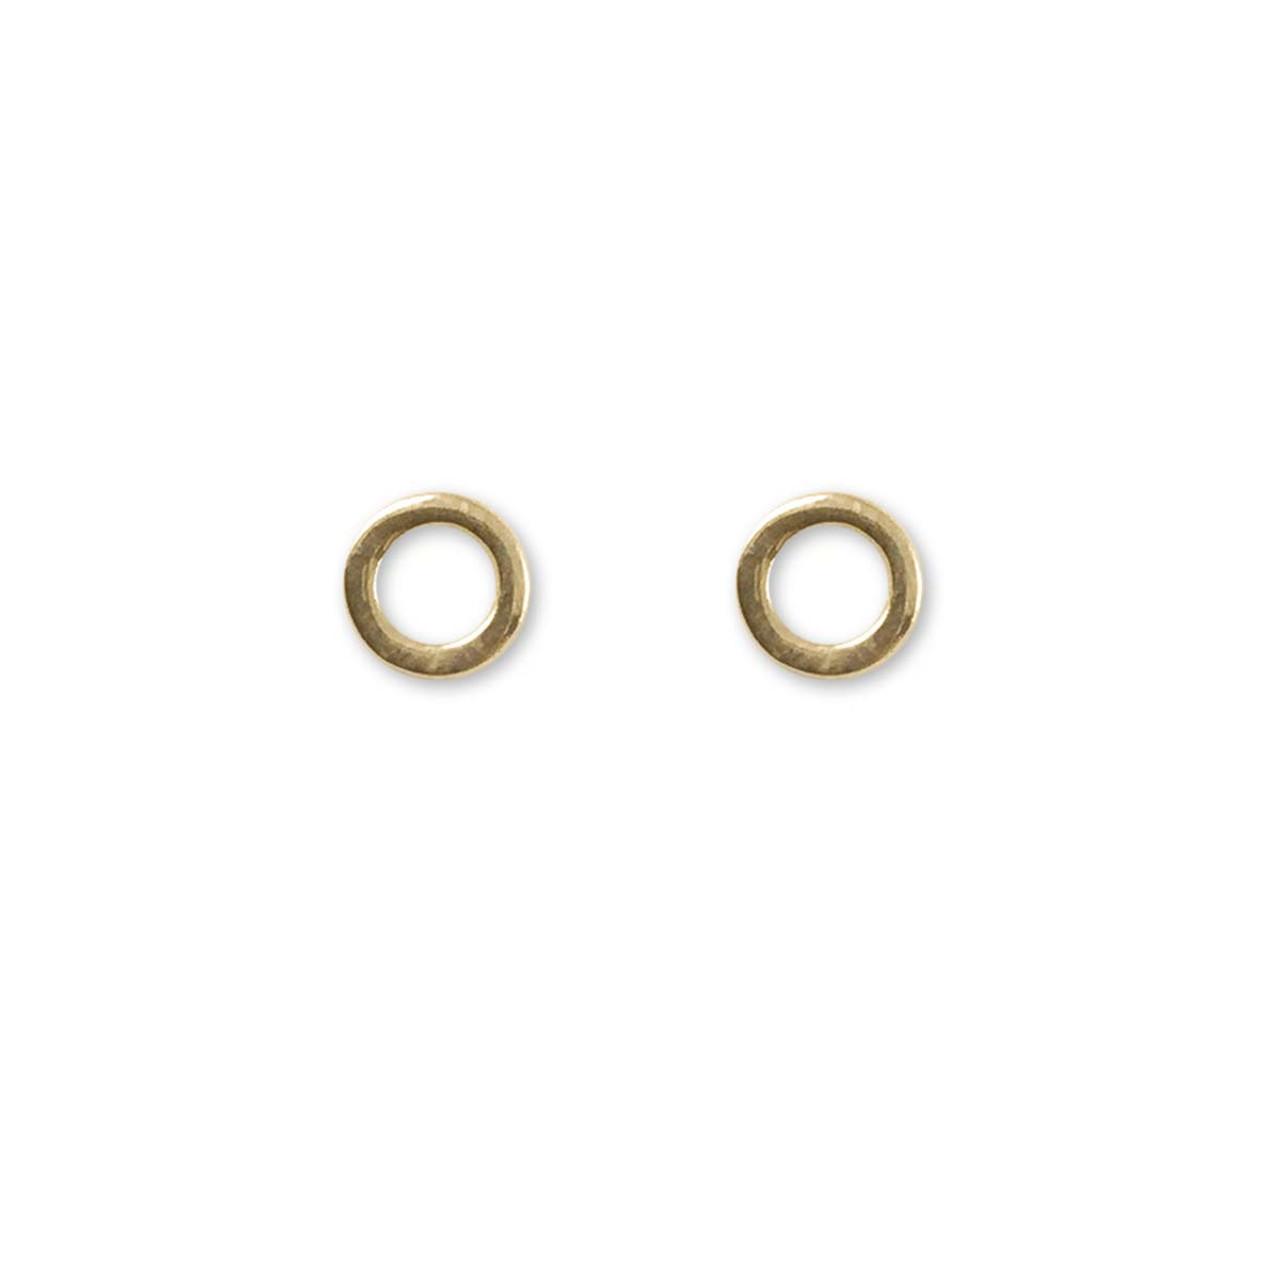 56bb87519 14kt Gold Circle Post Earrings - JH Breakell & Co.